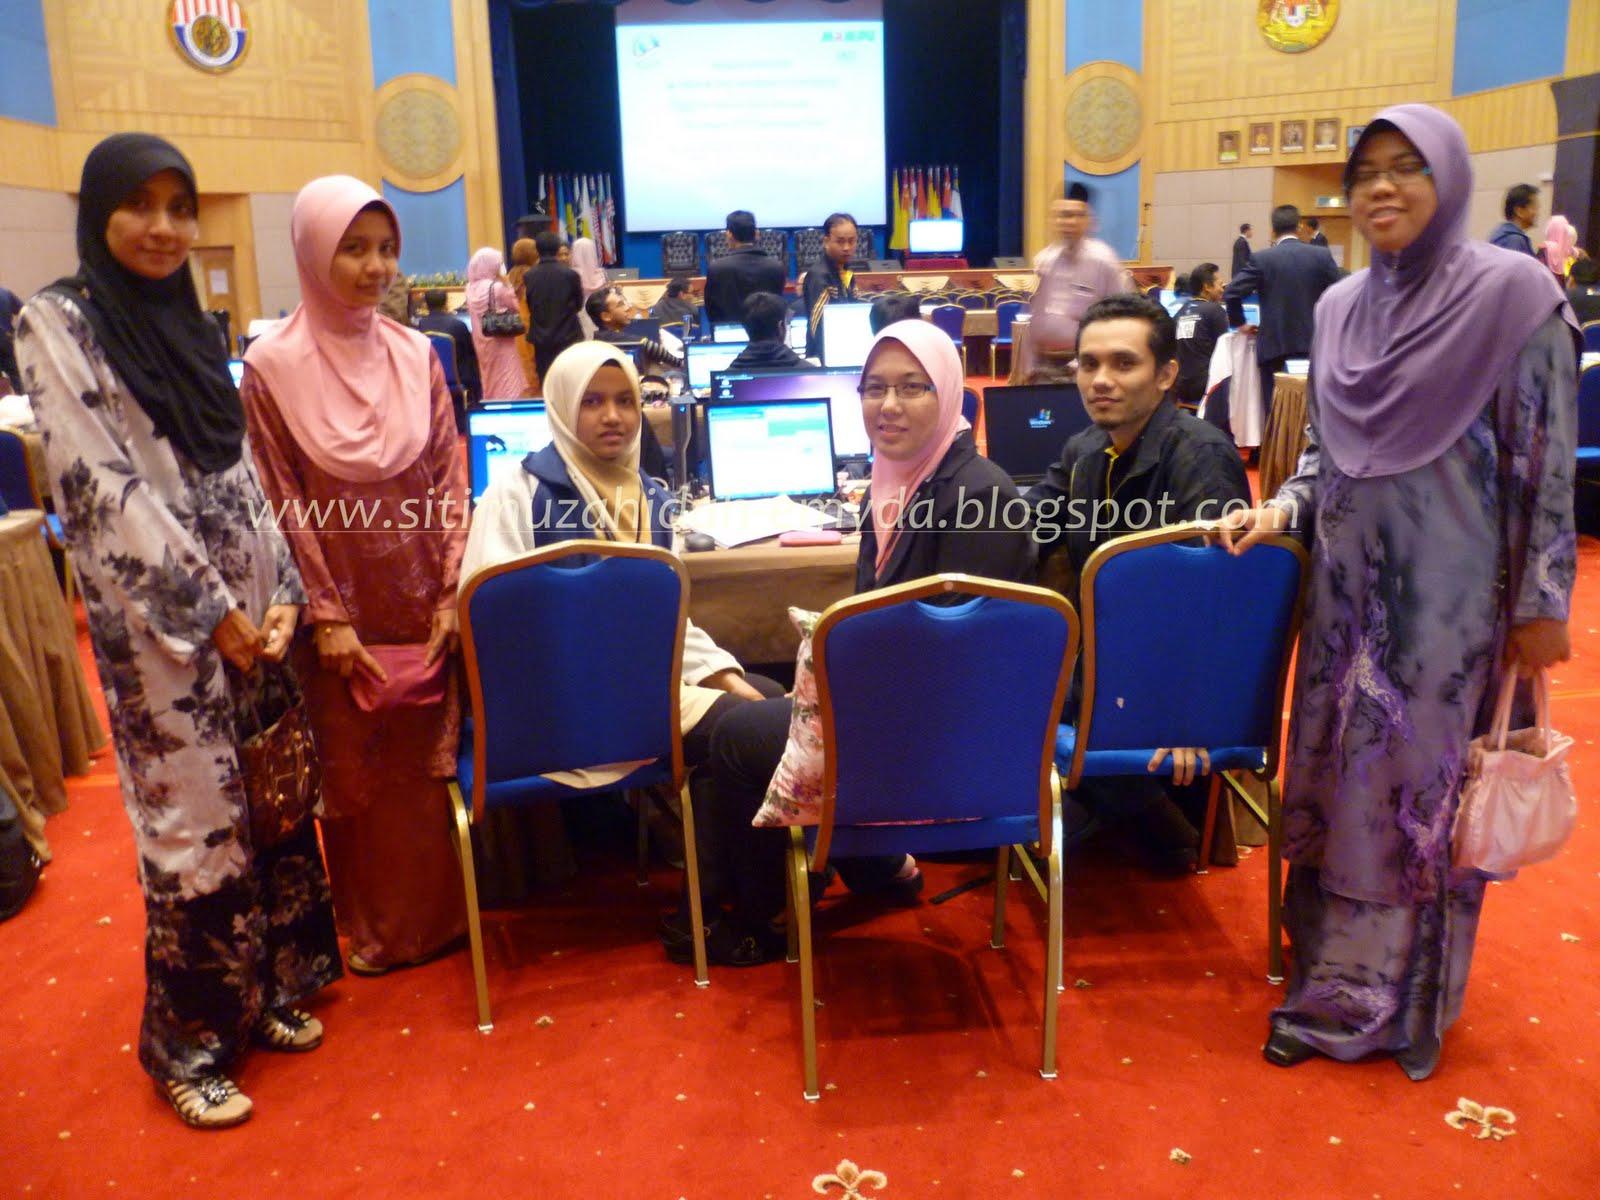 Malacca trip essay